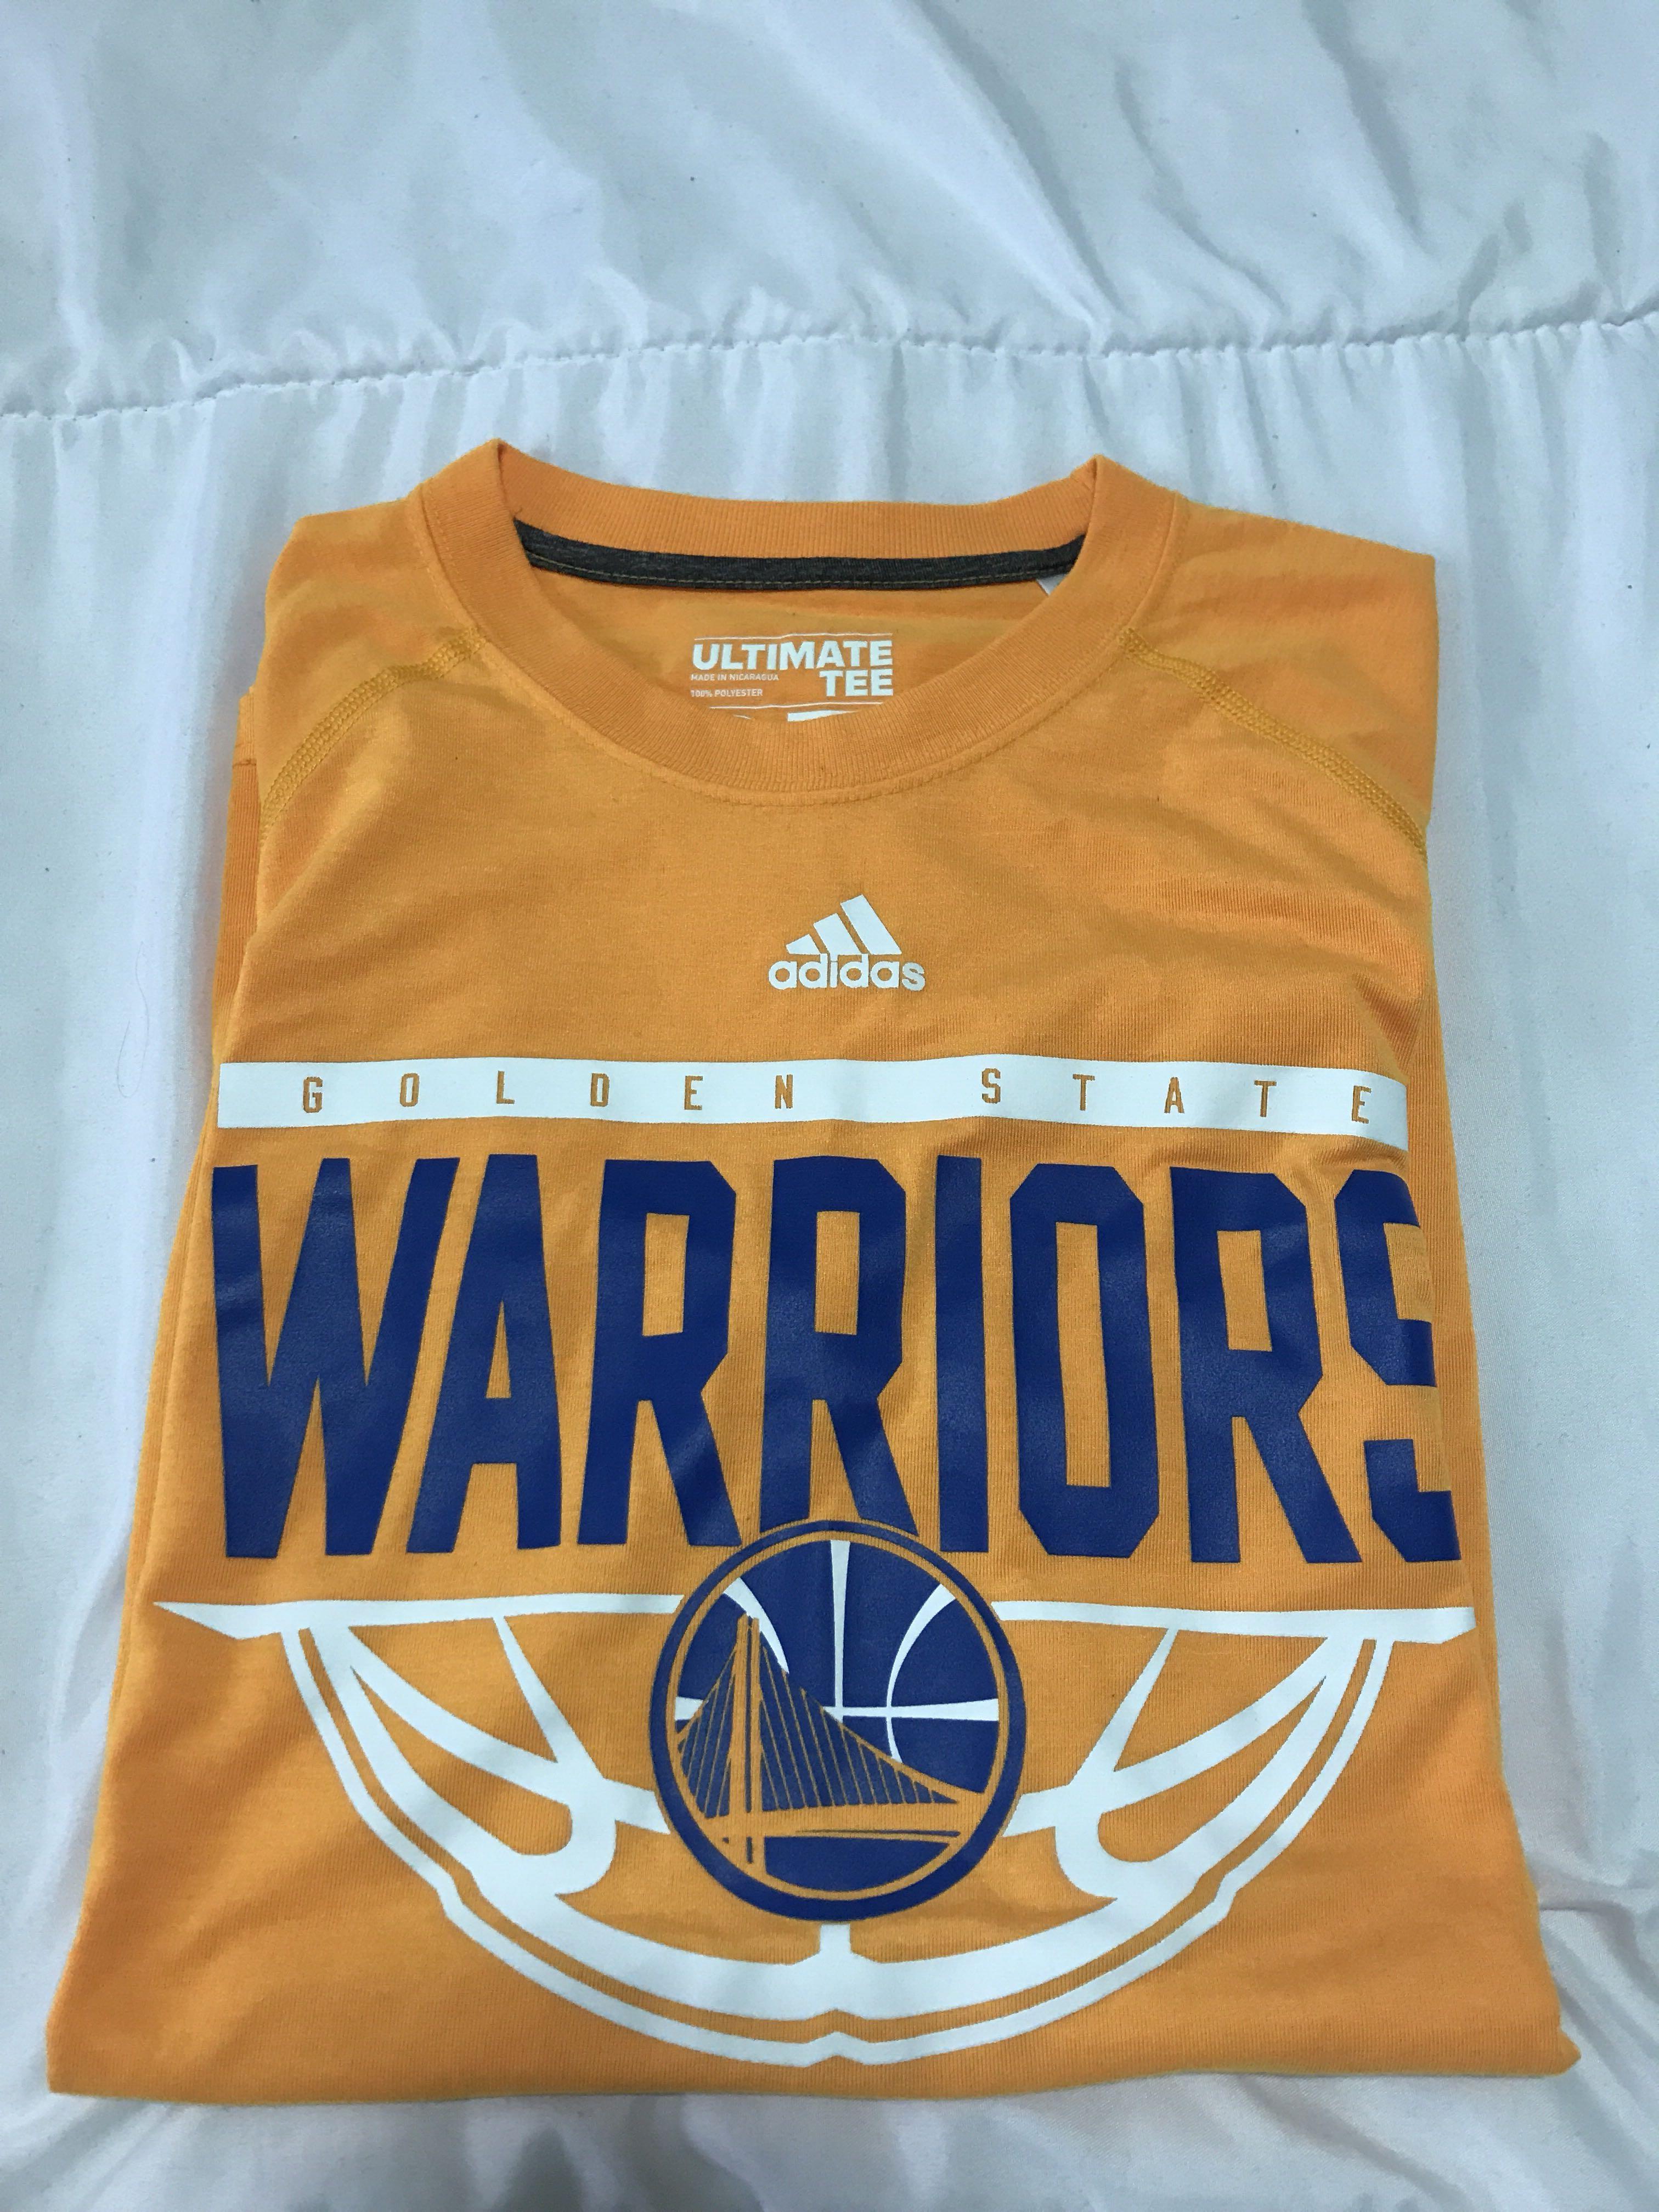 72456d6c93bfb6 Exclusive NBA FINAL CHAMPION Golden State Warriors Adidas Apparel ...